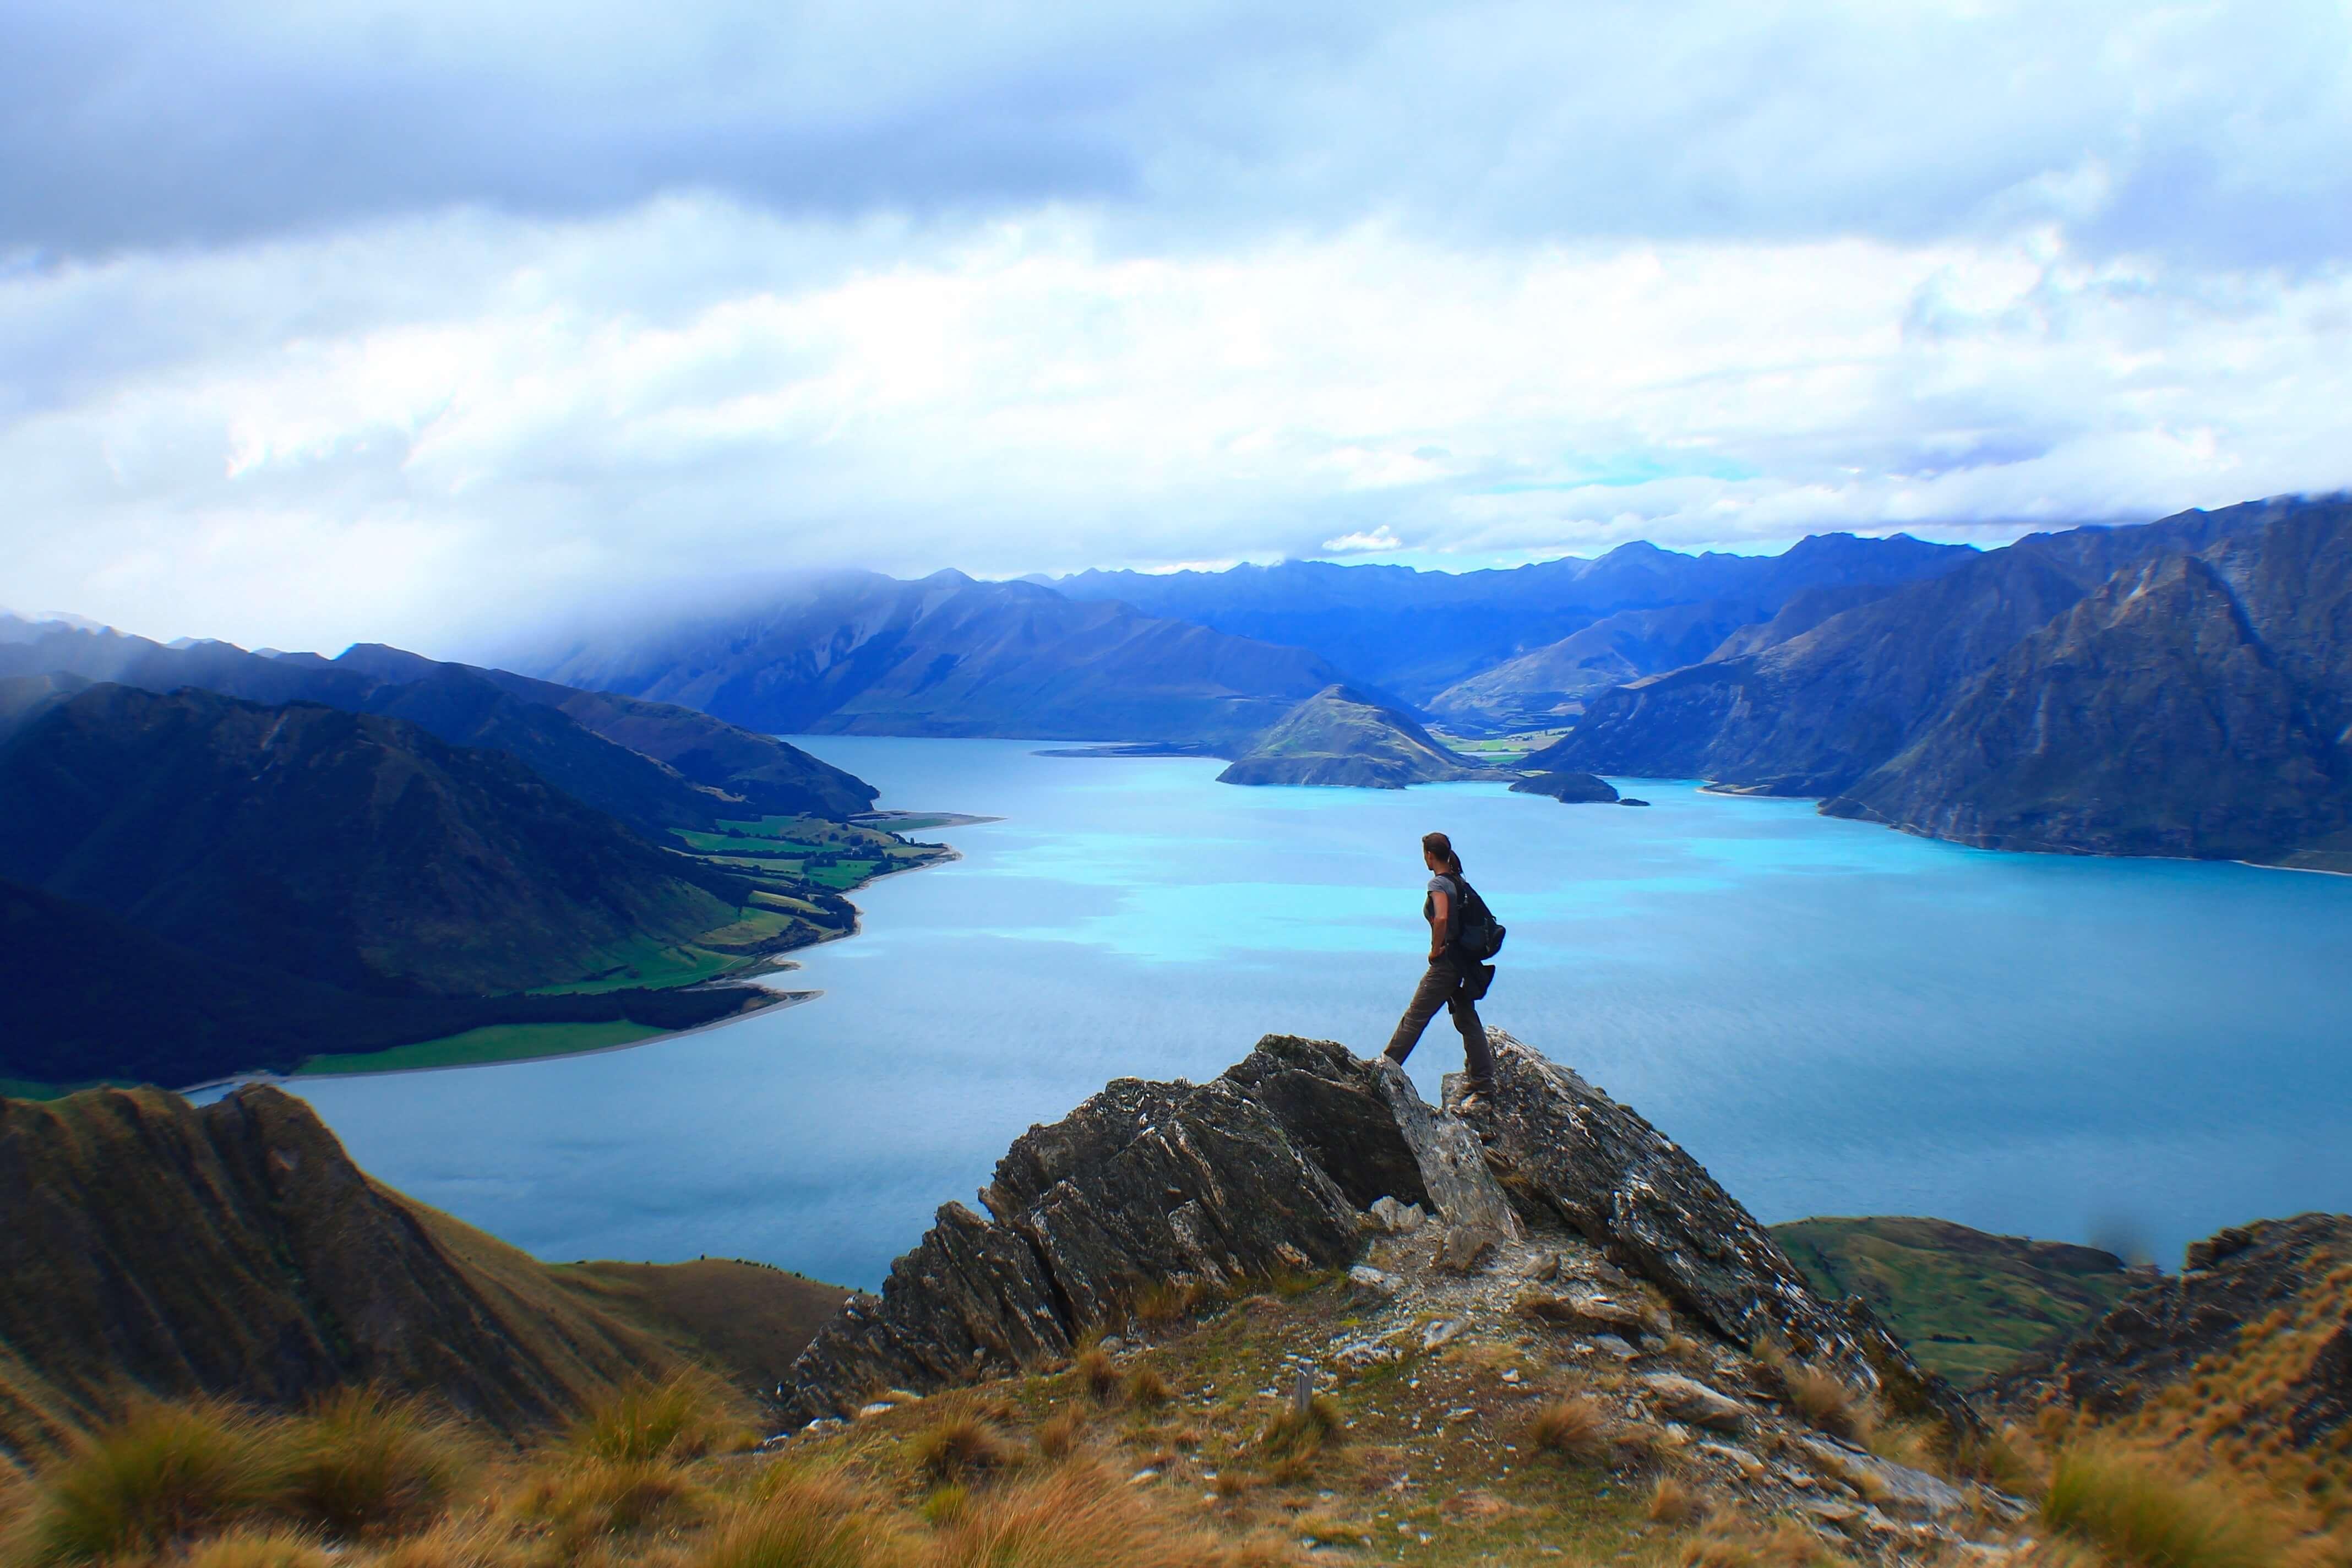 Hiking Isthmus Peak, 3 week New Zealand Road Trip Itinerary